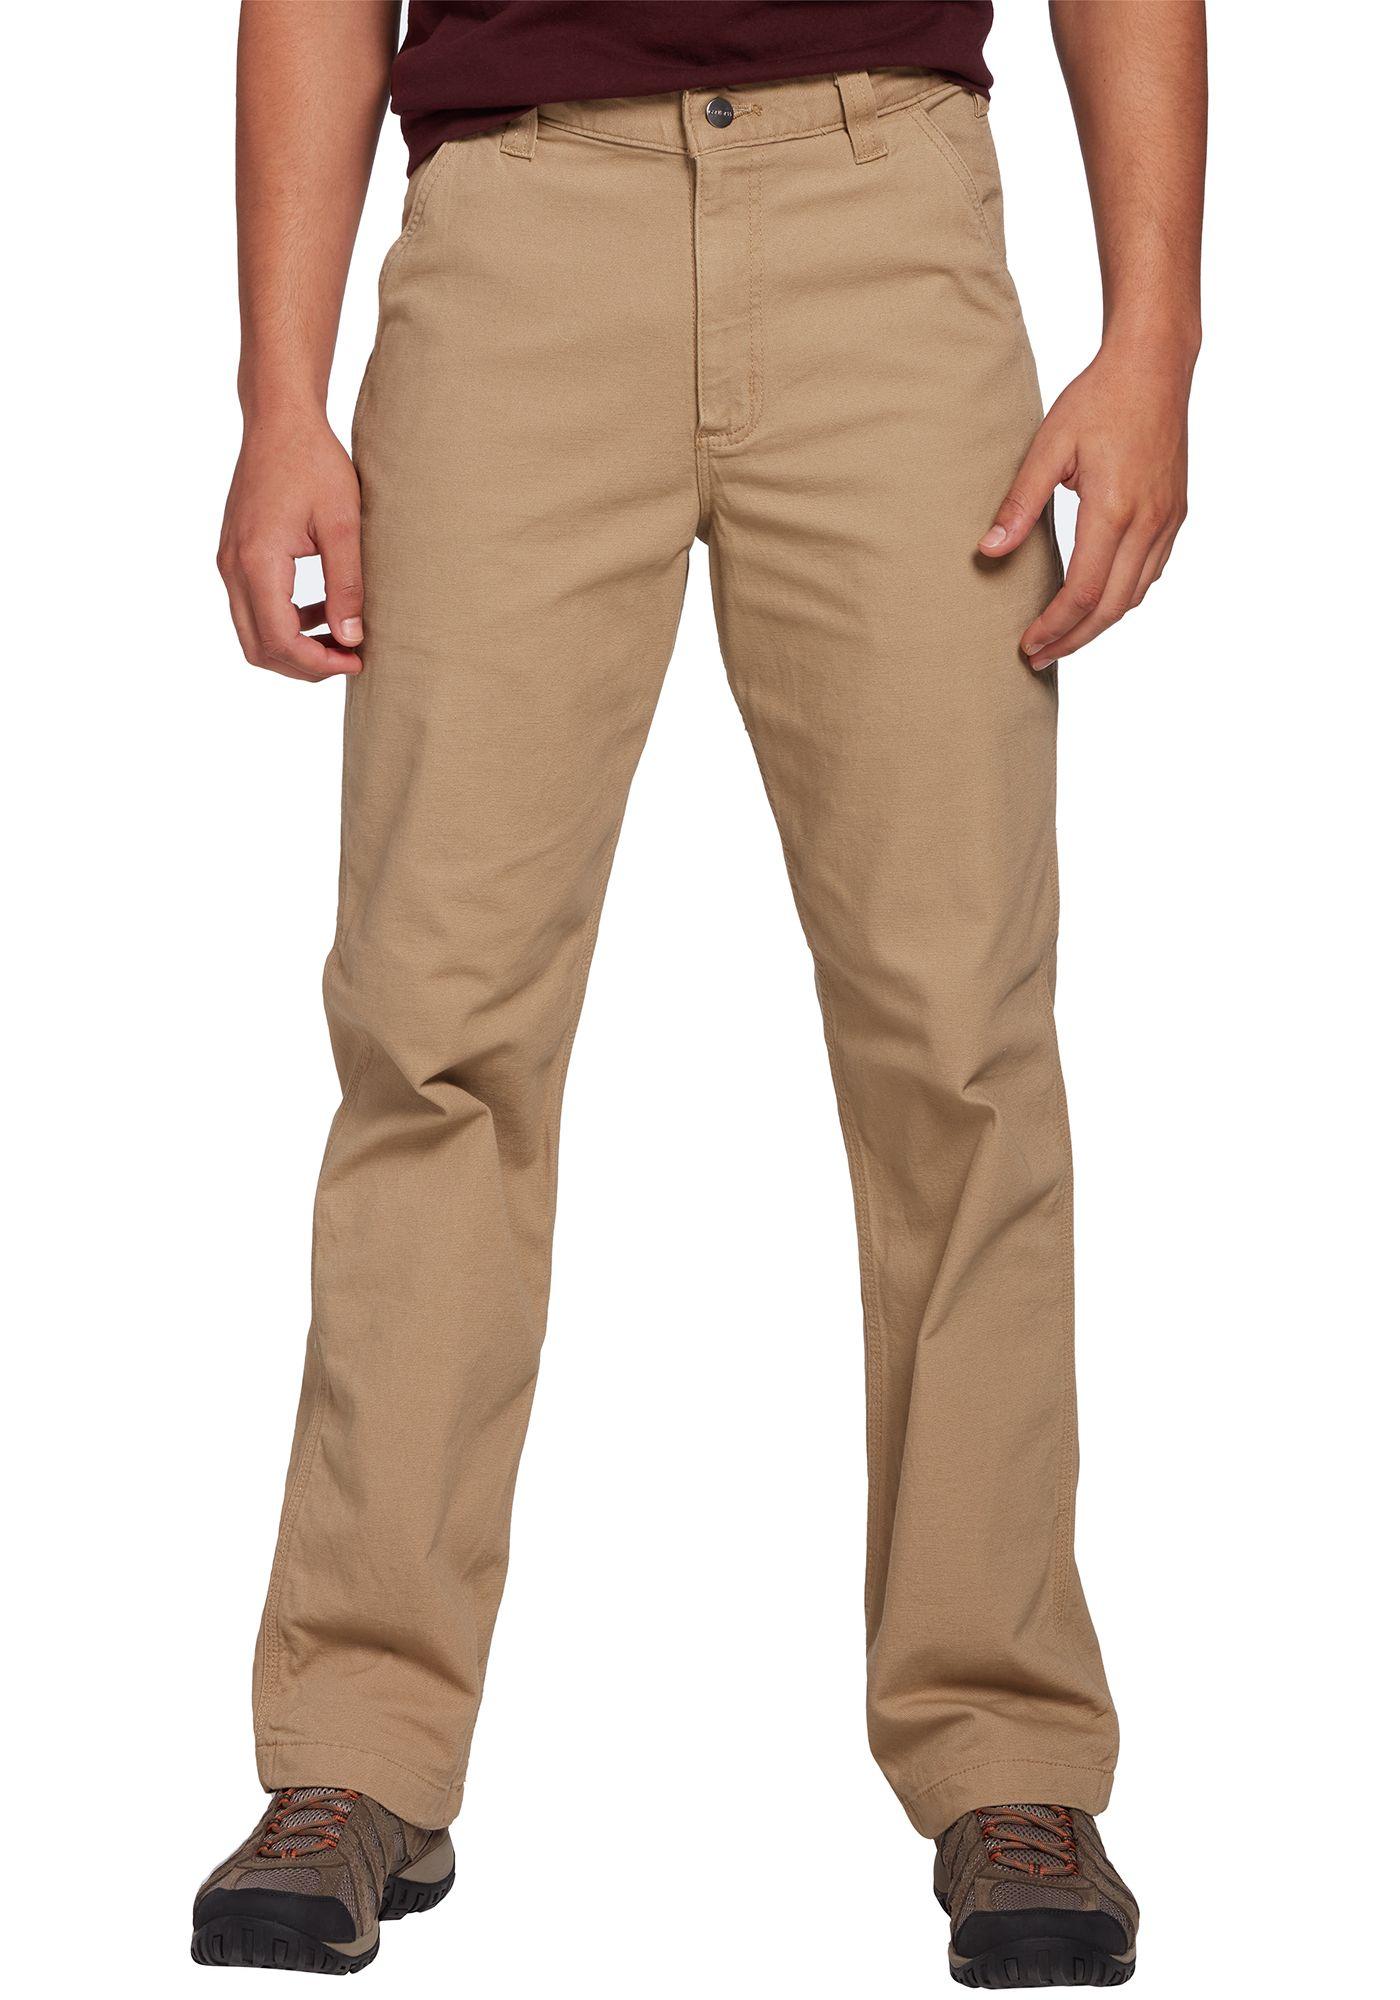 Carhartt Men's Rugged Flex Rigby Dungaree Pants (Regular and Big & Tall)